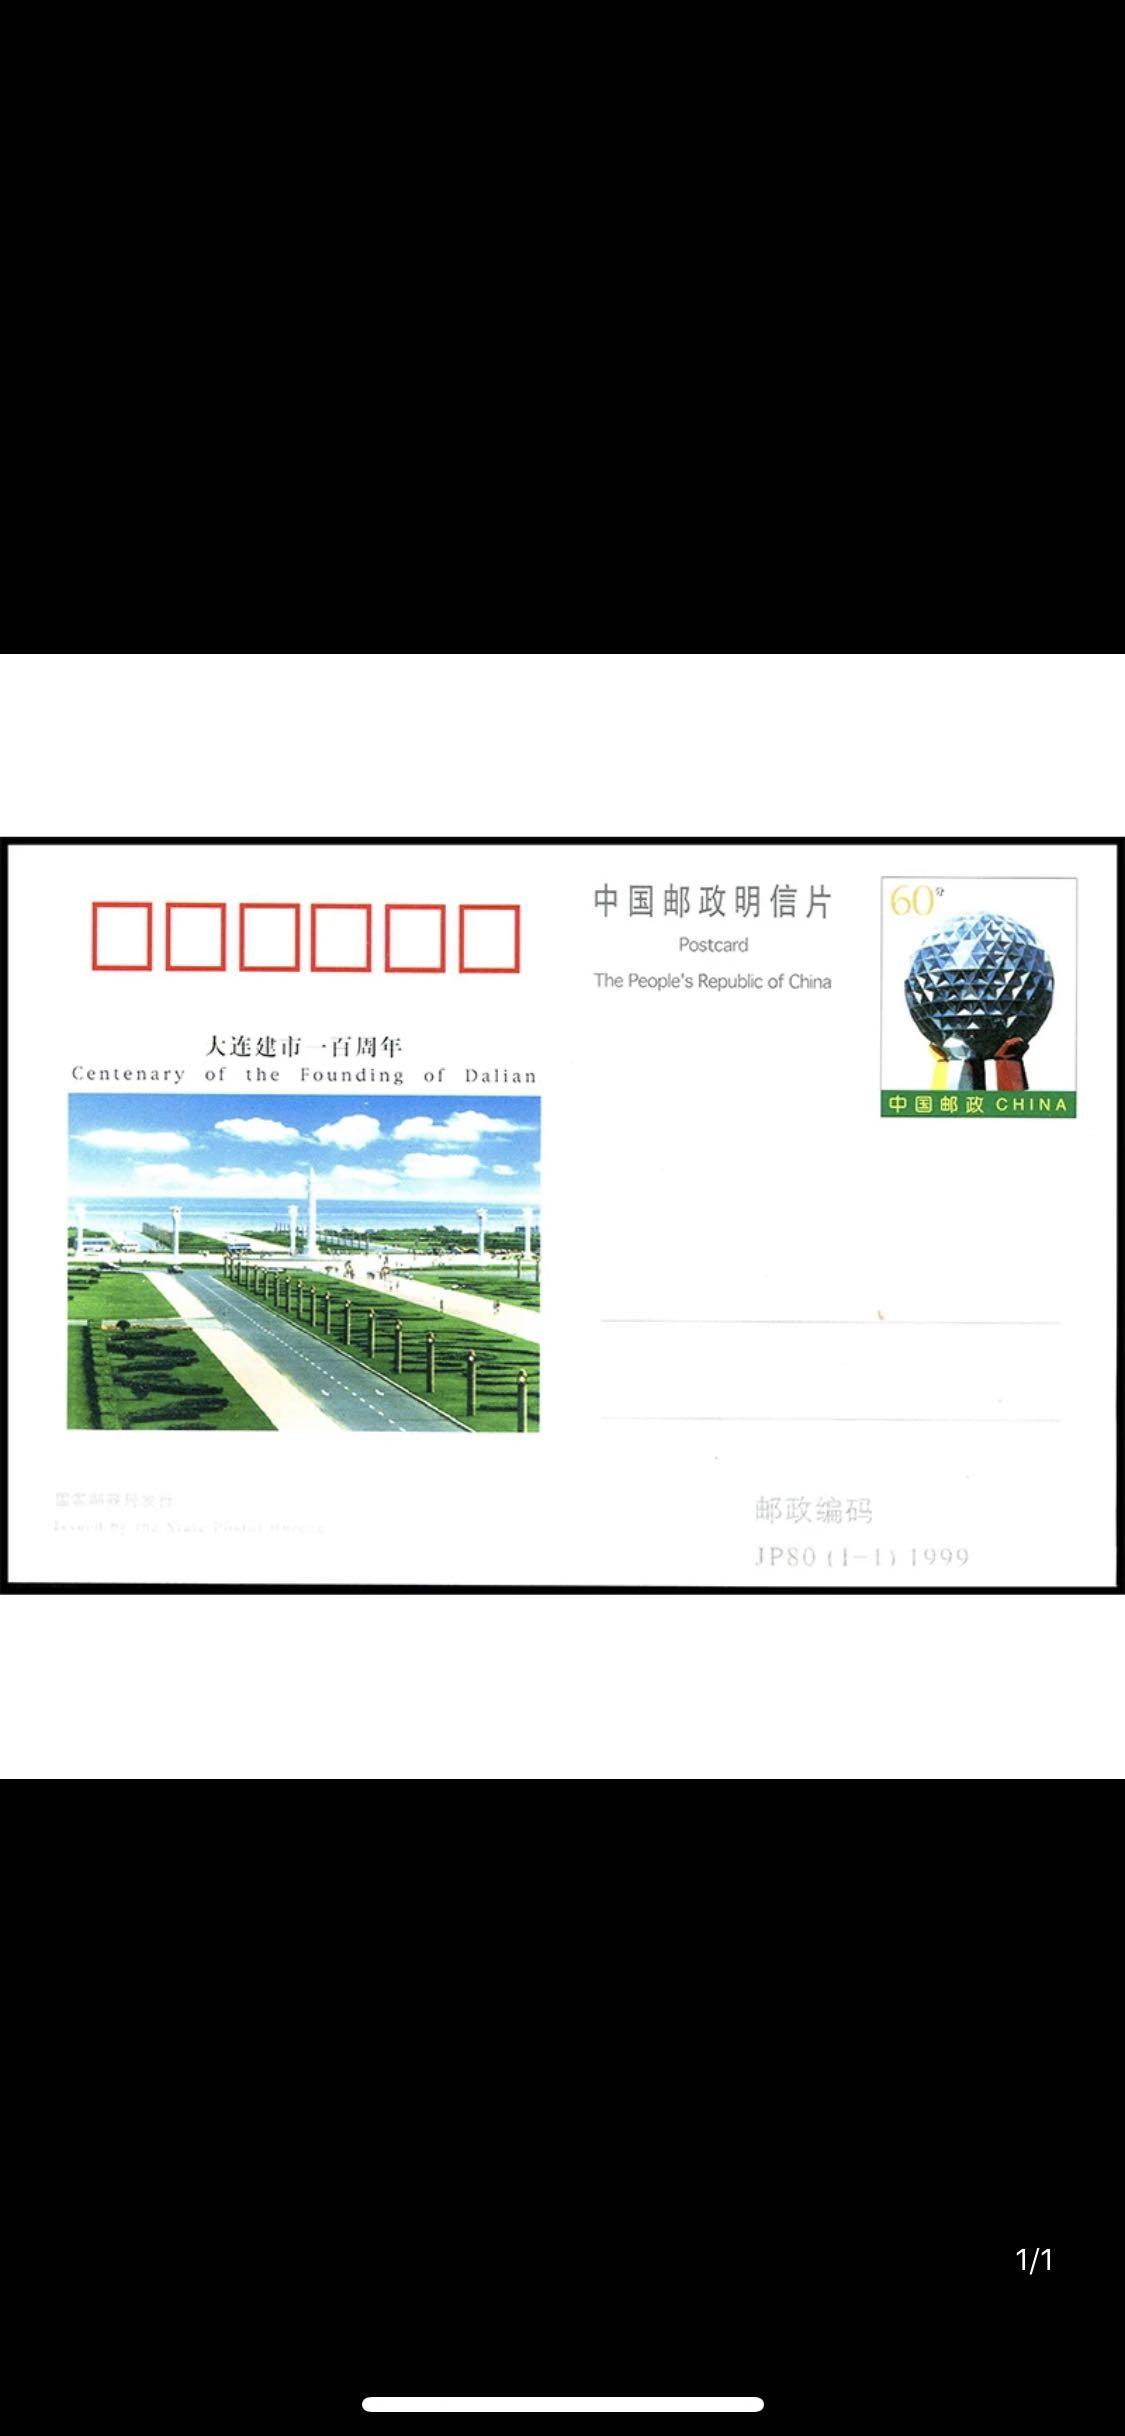 JP80 大连建市100周年 纪念邮资明信片  中品  邮局正品 Изображение 1